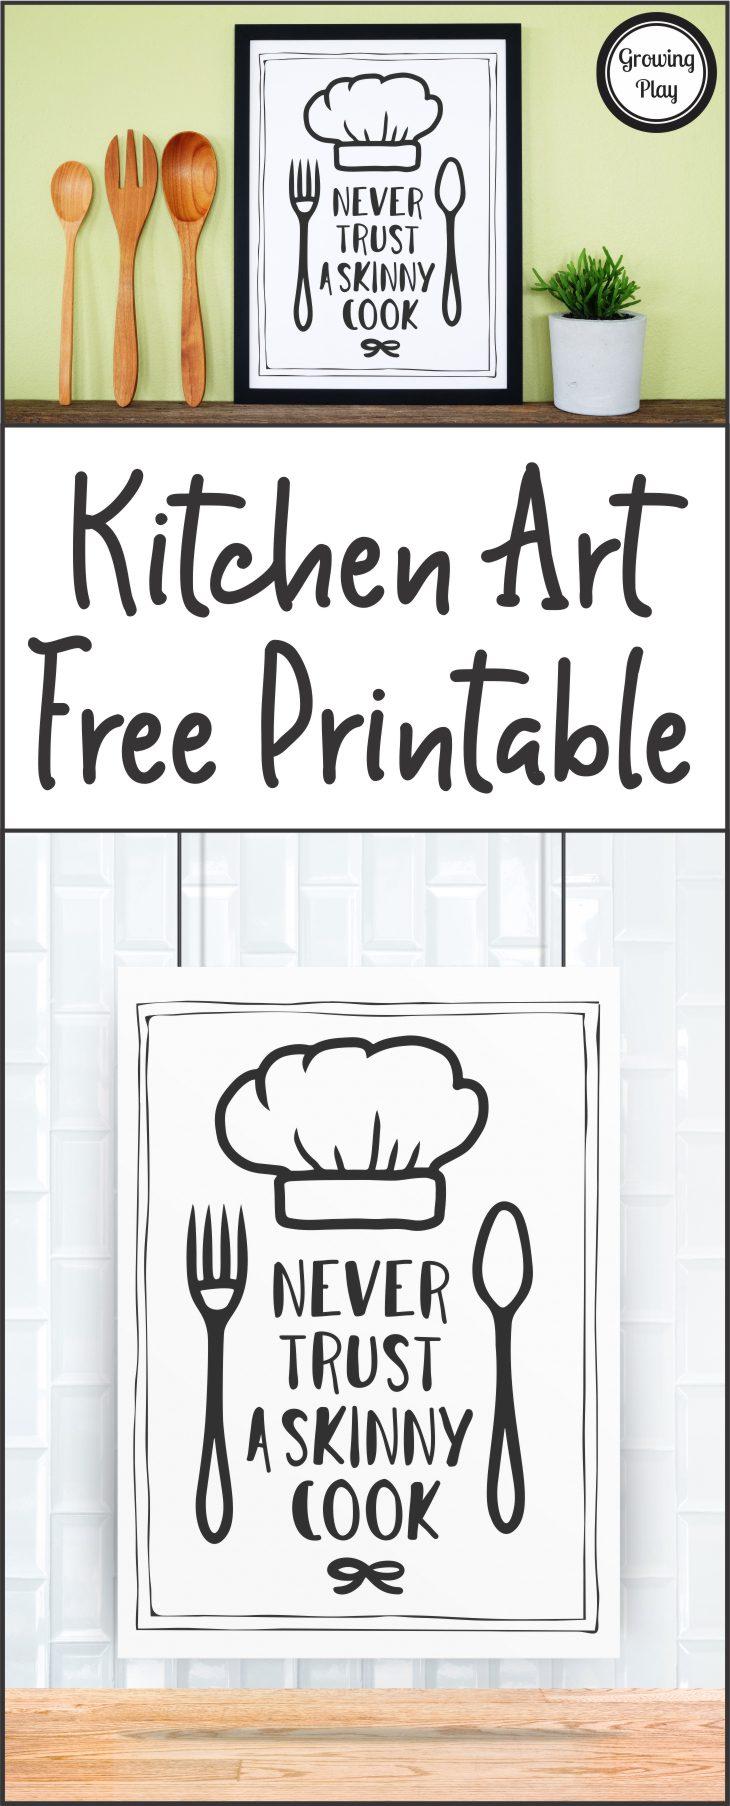 Fun Kitchen Art Freebie